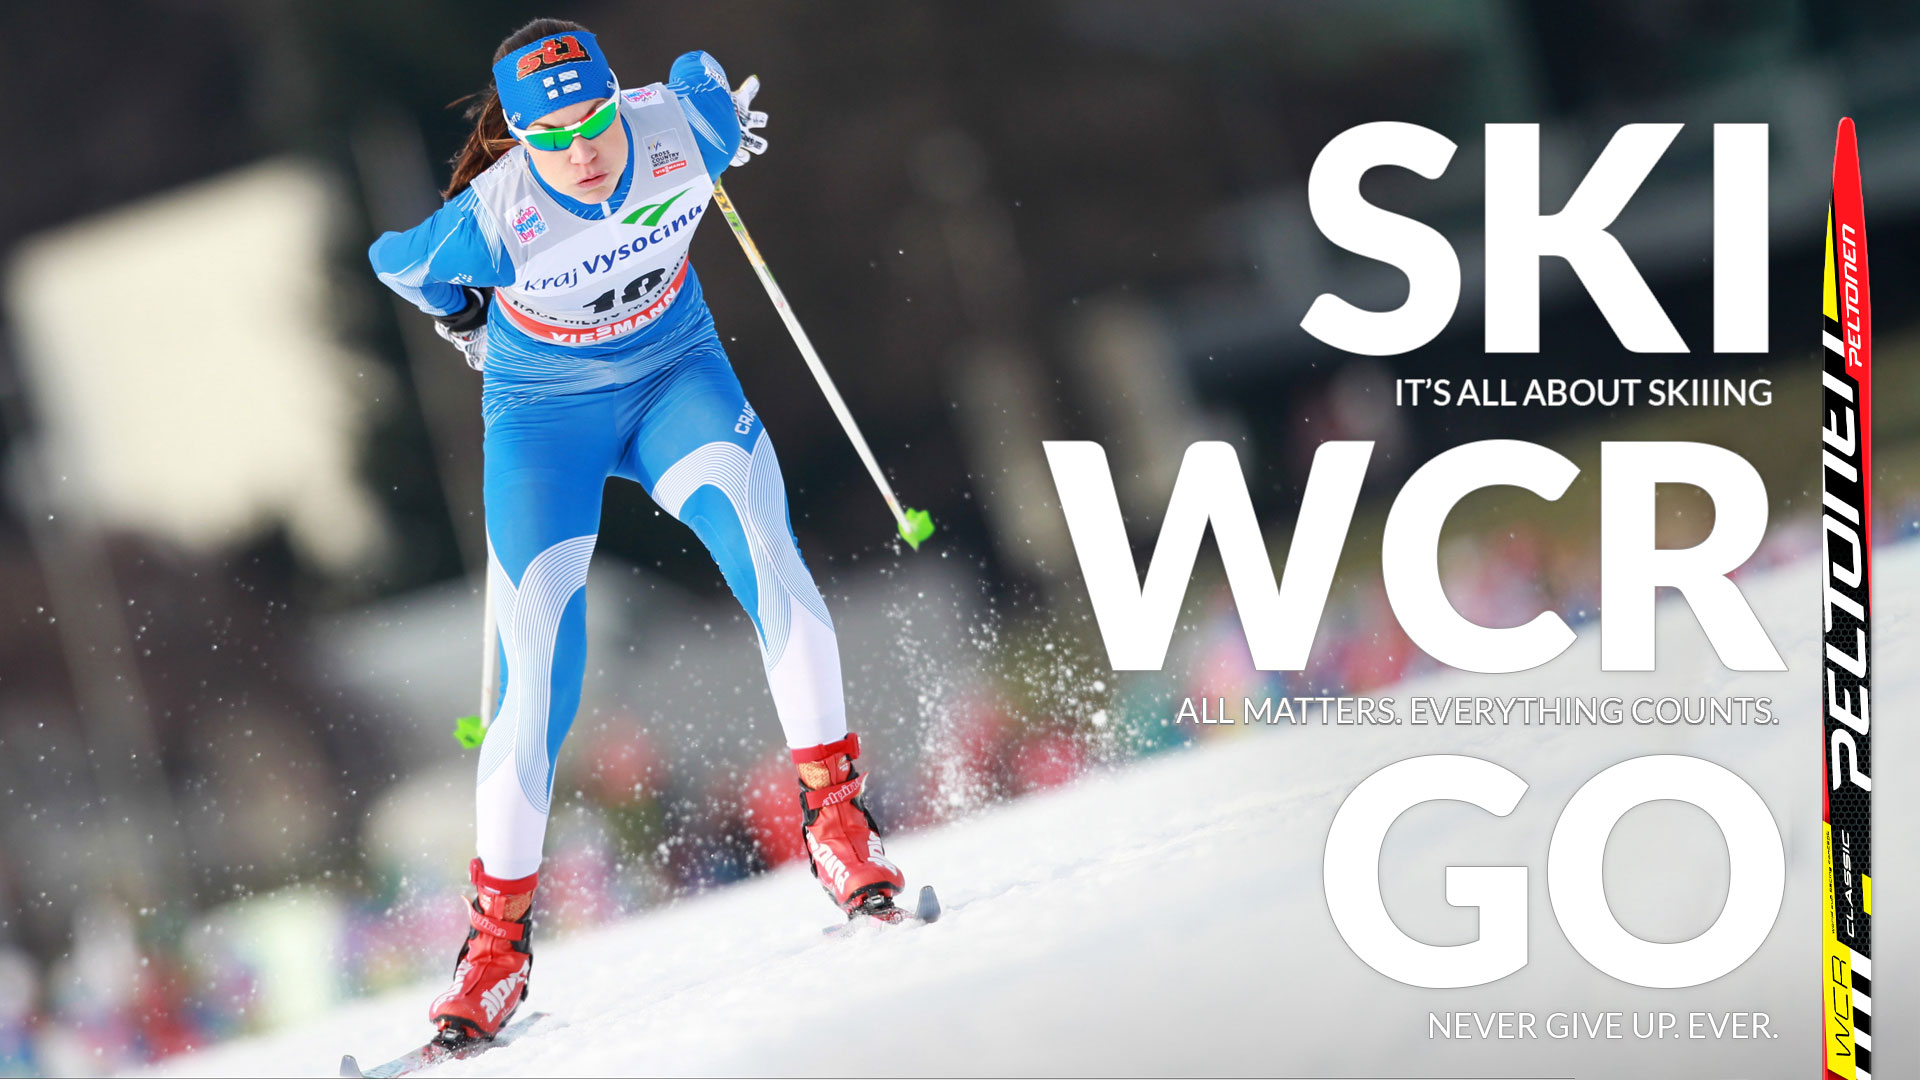 Ski WCR Go